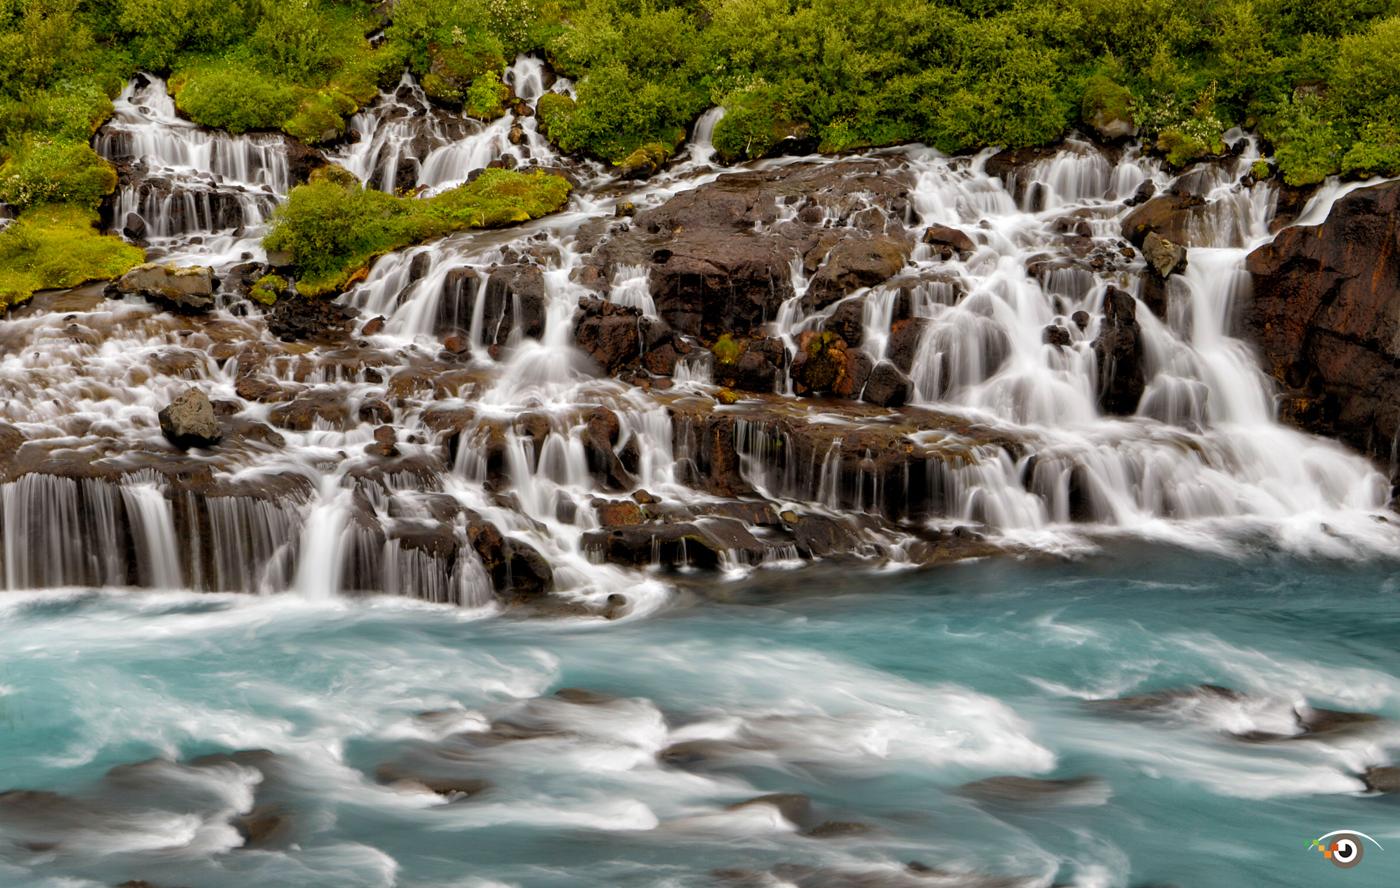 Rick Sammon Iceland 13.jpg